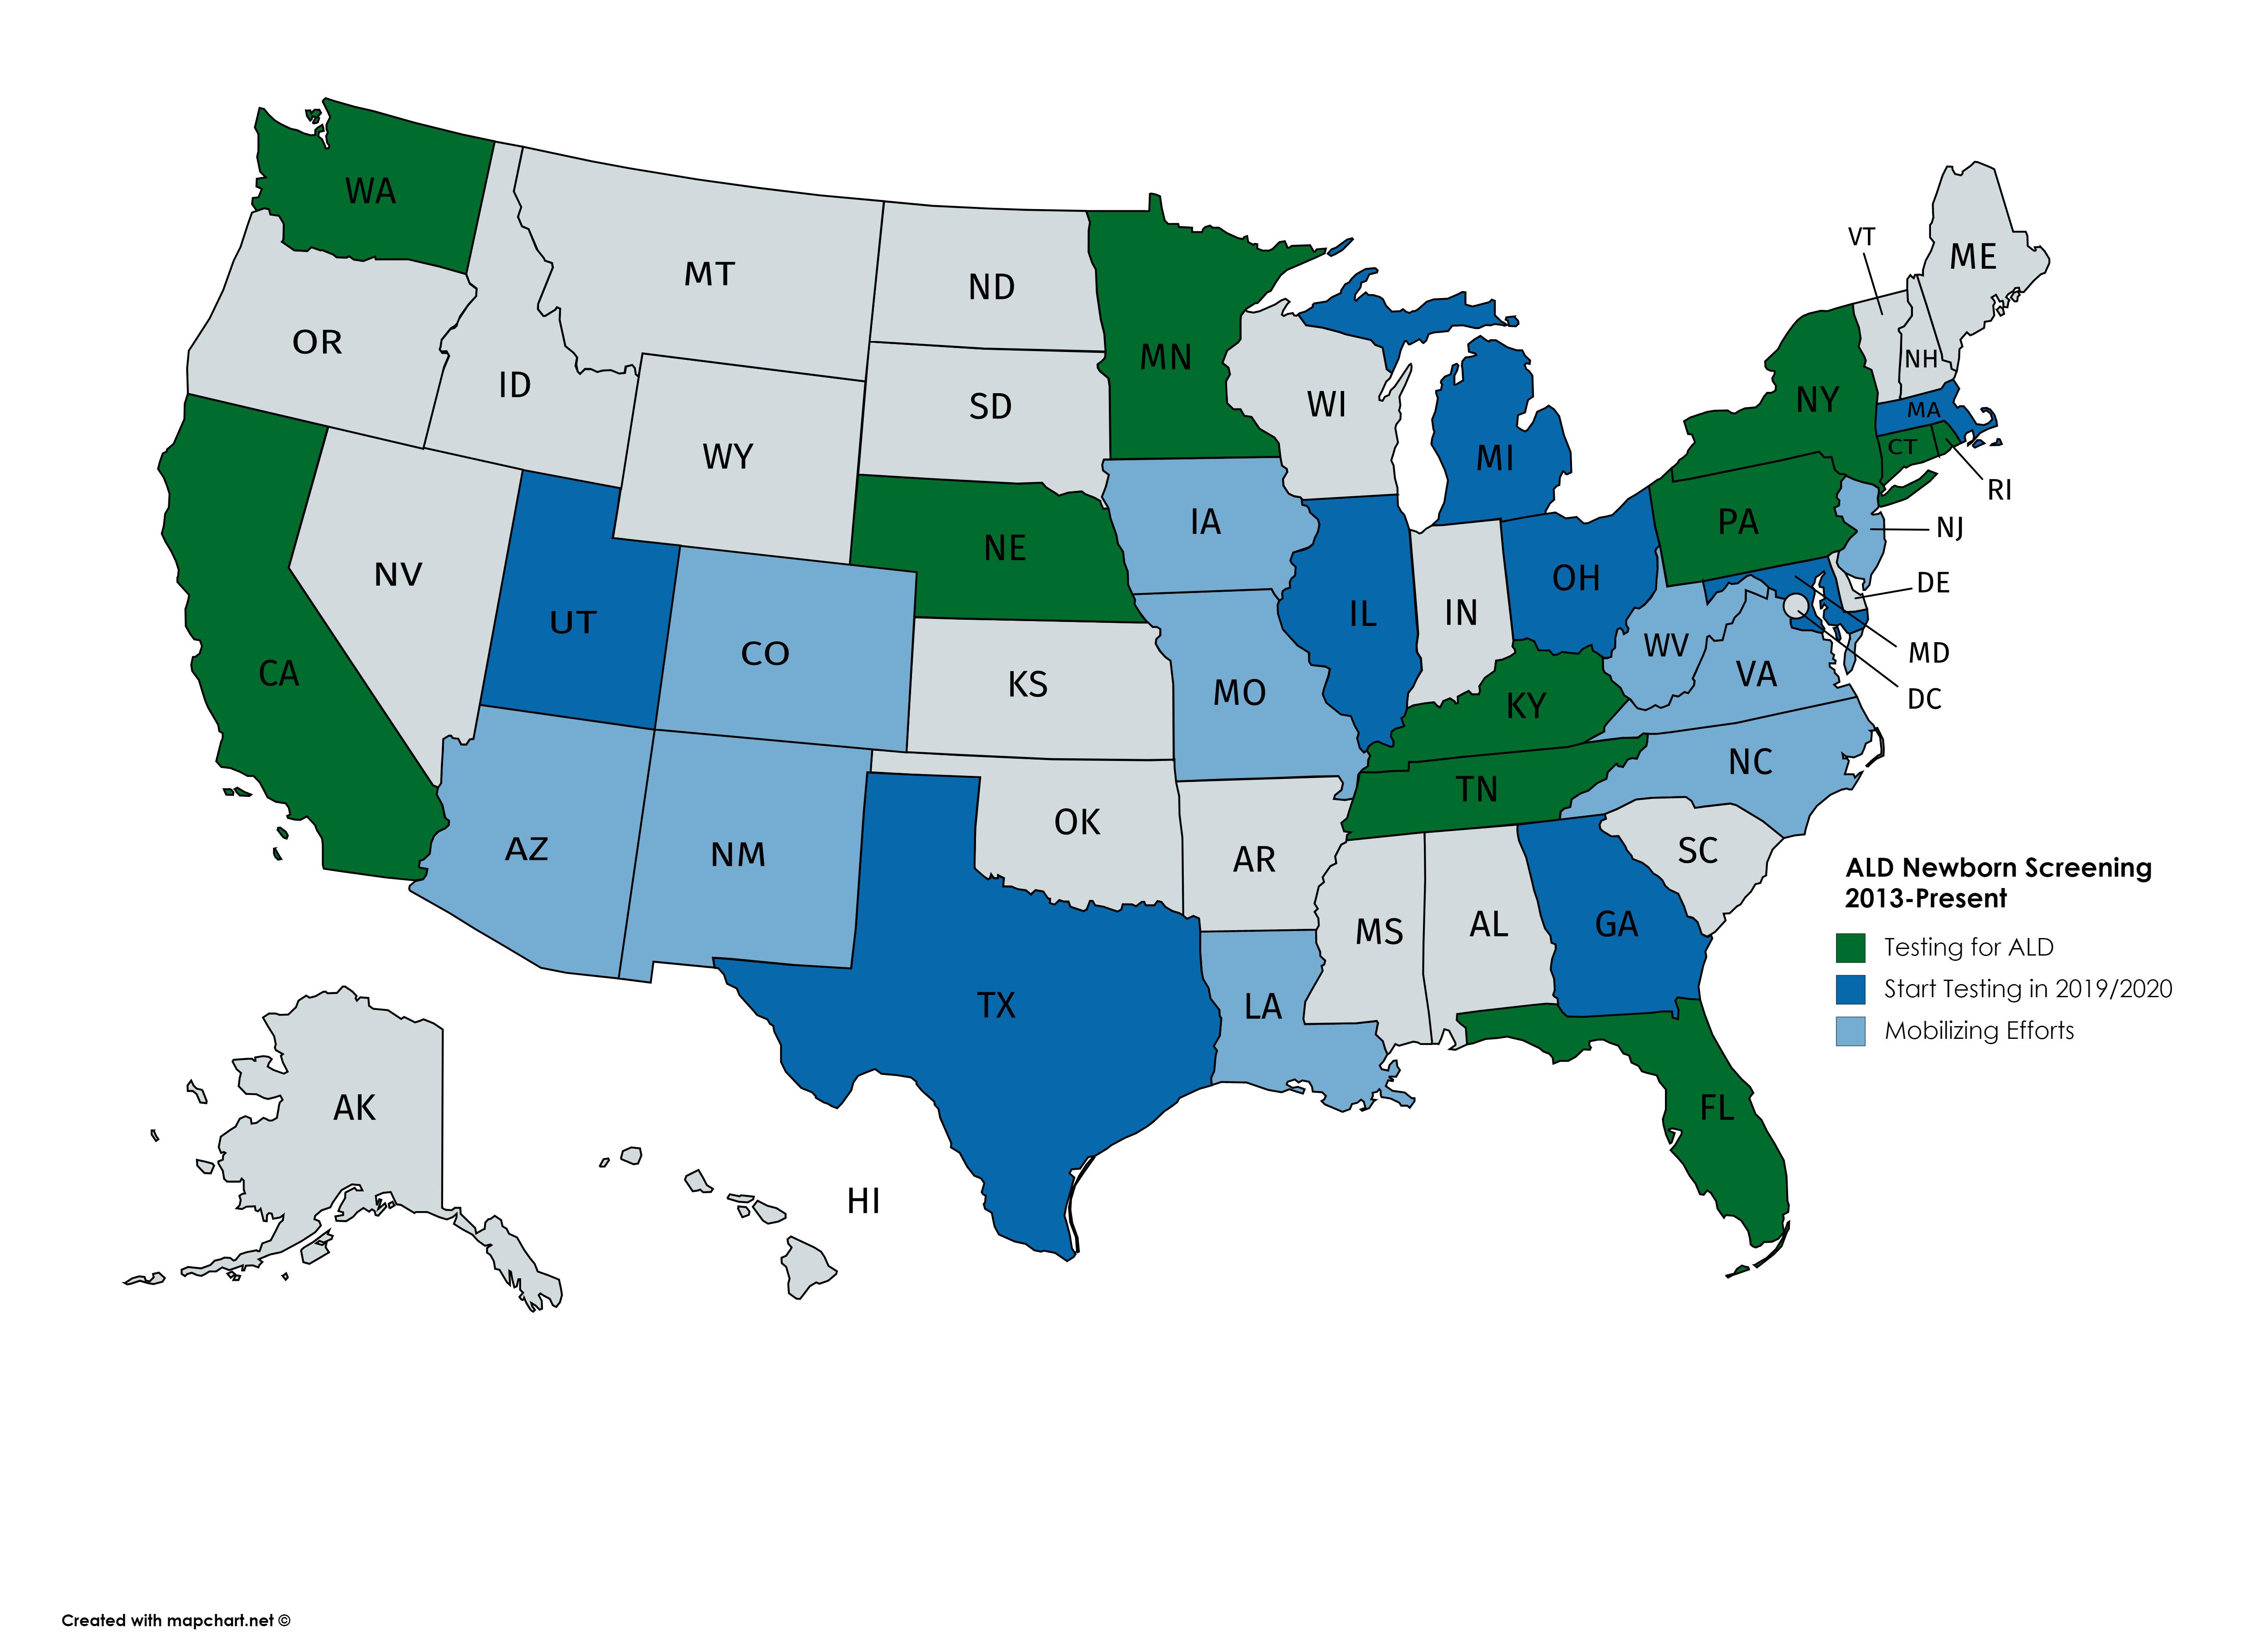 Status of newborn screening across the US